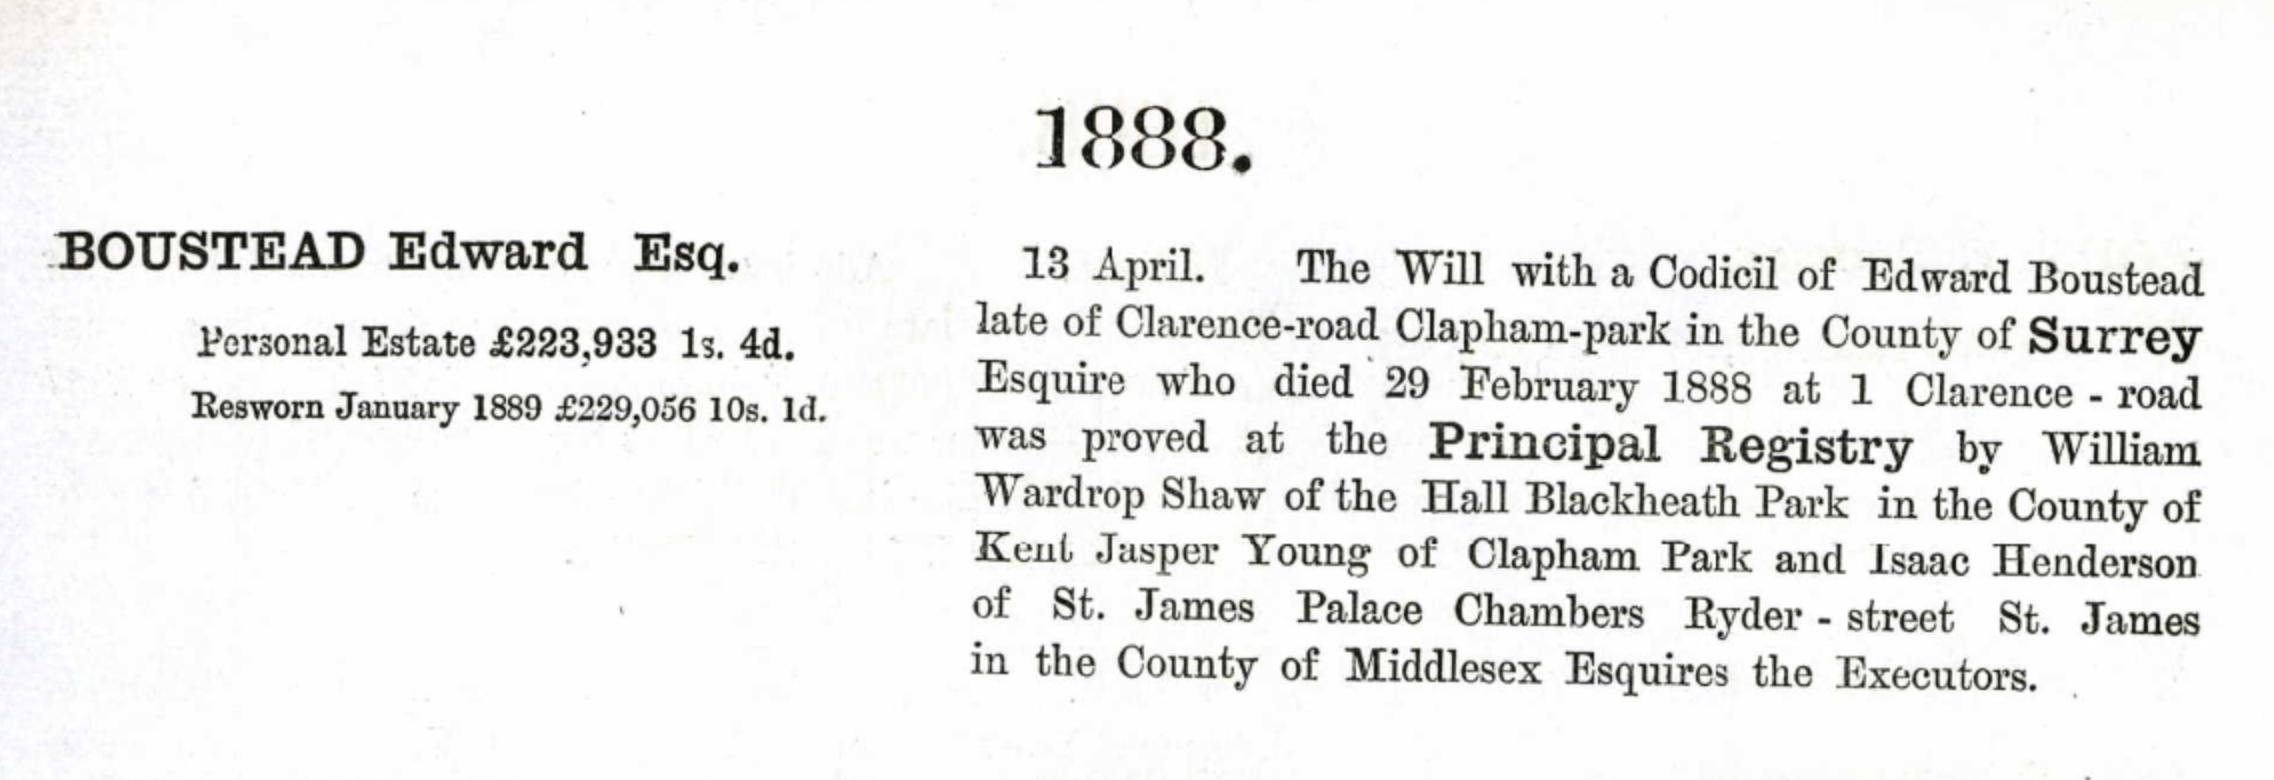 Edward Boustead Probate 1888